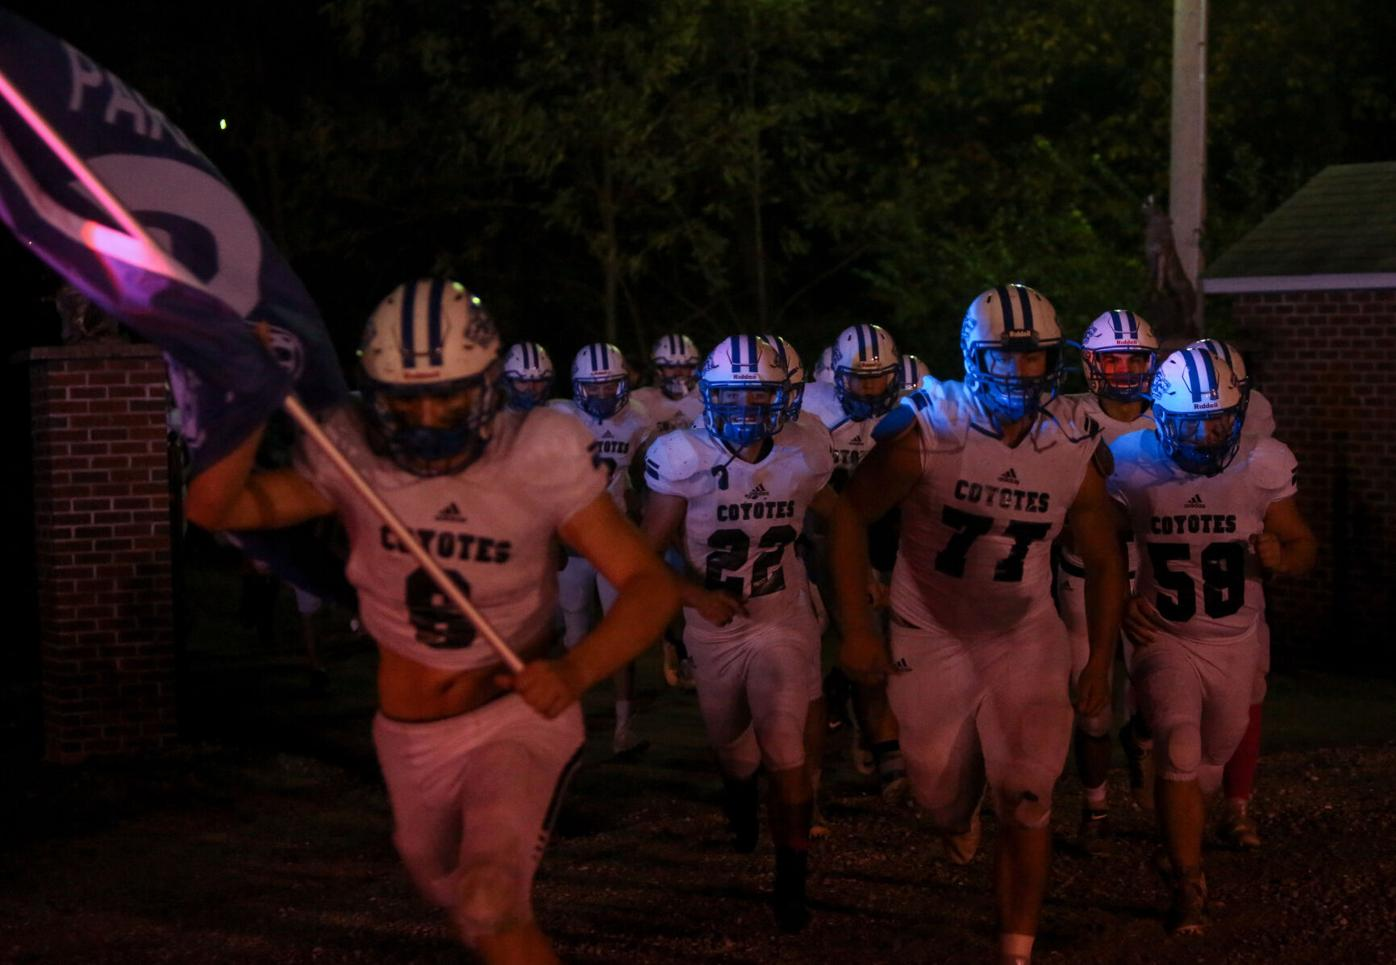 The Paris High School football team runs onto Warbritton Field